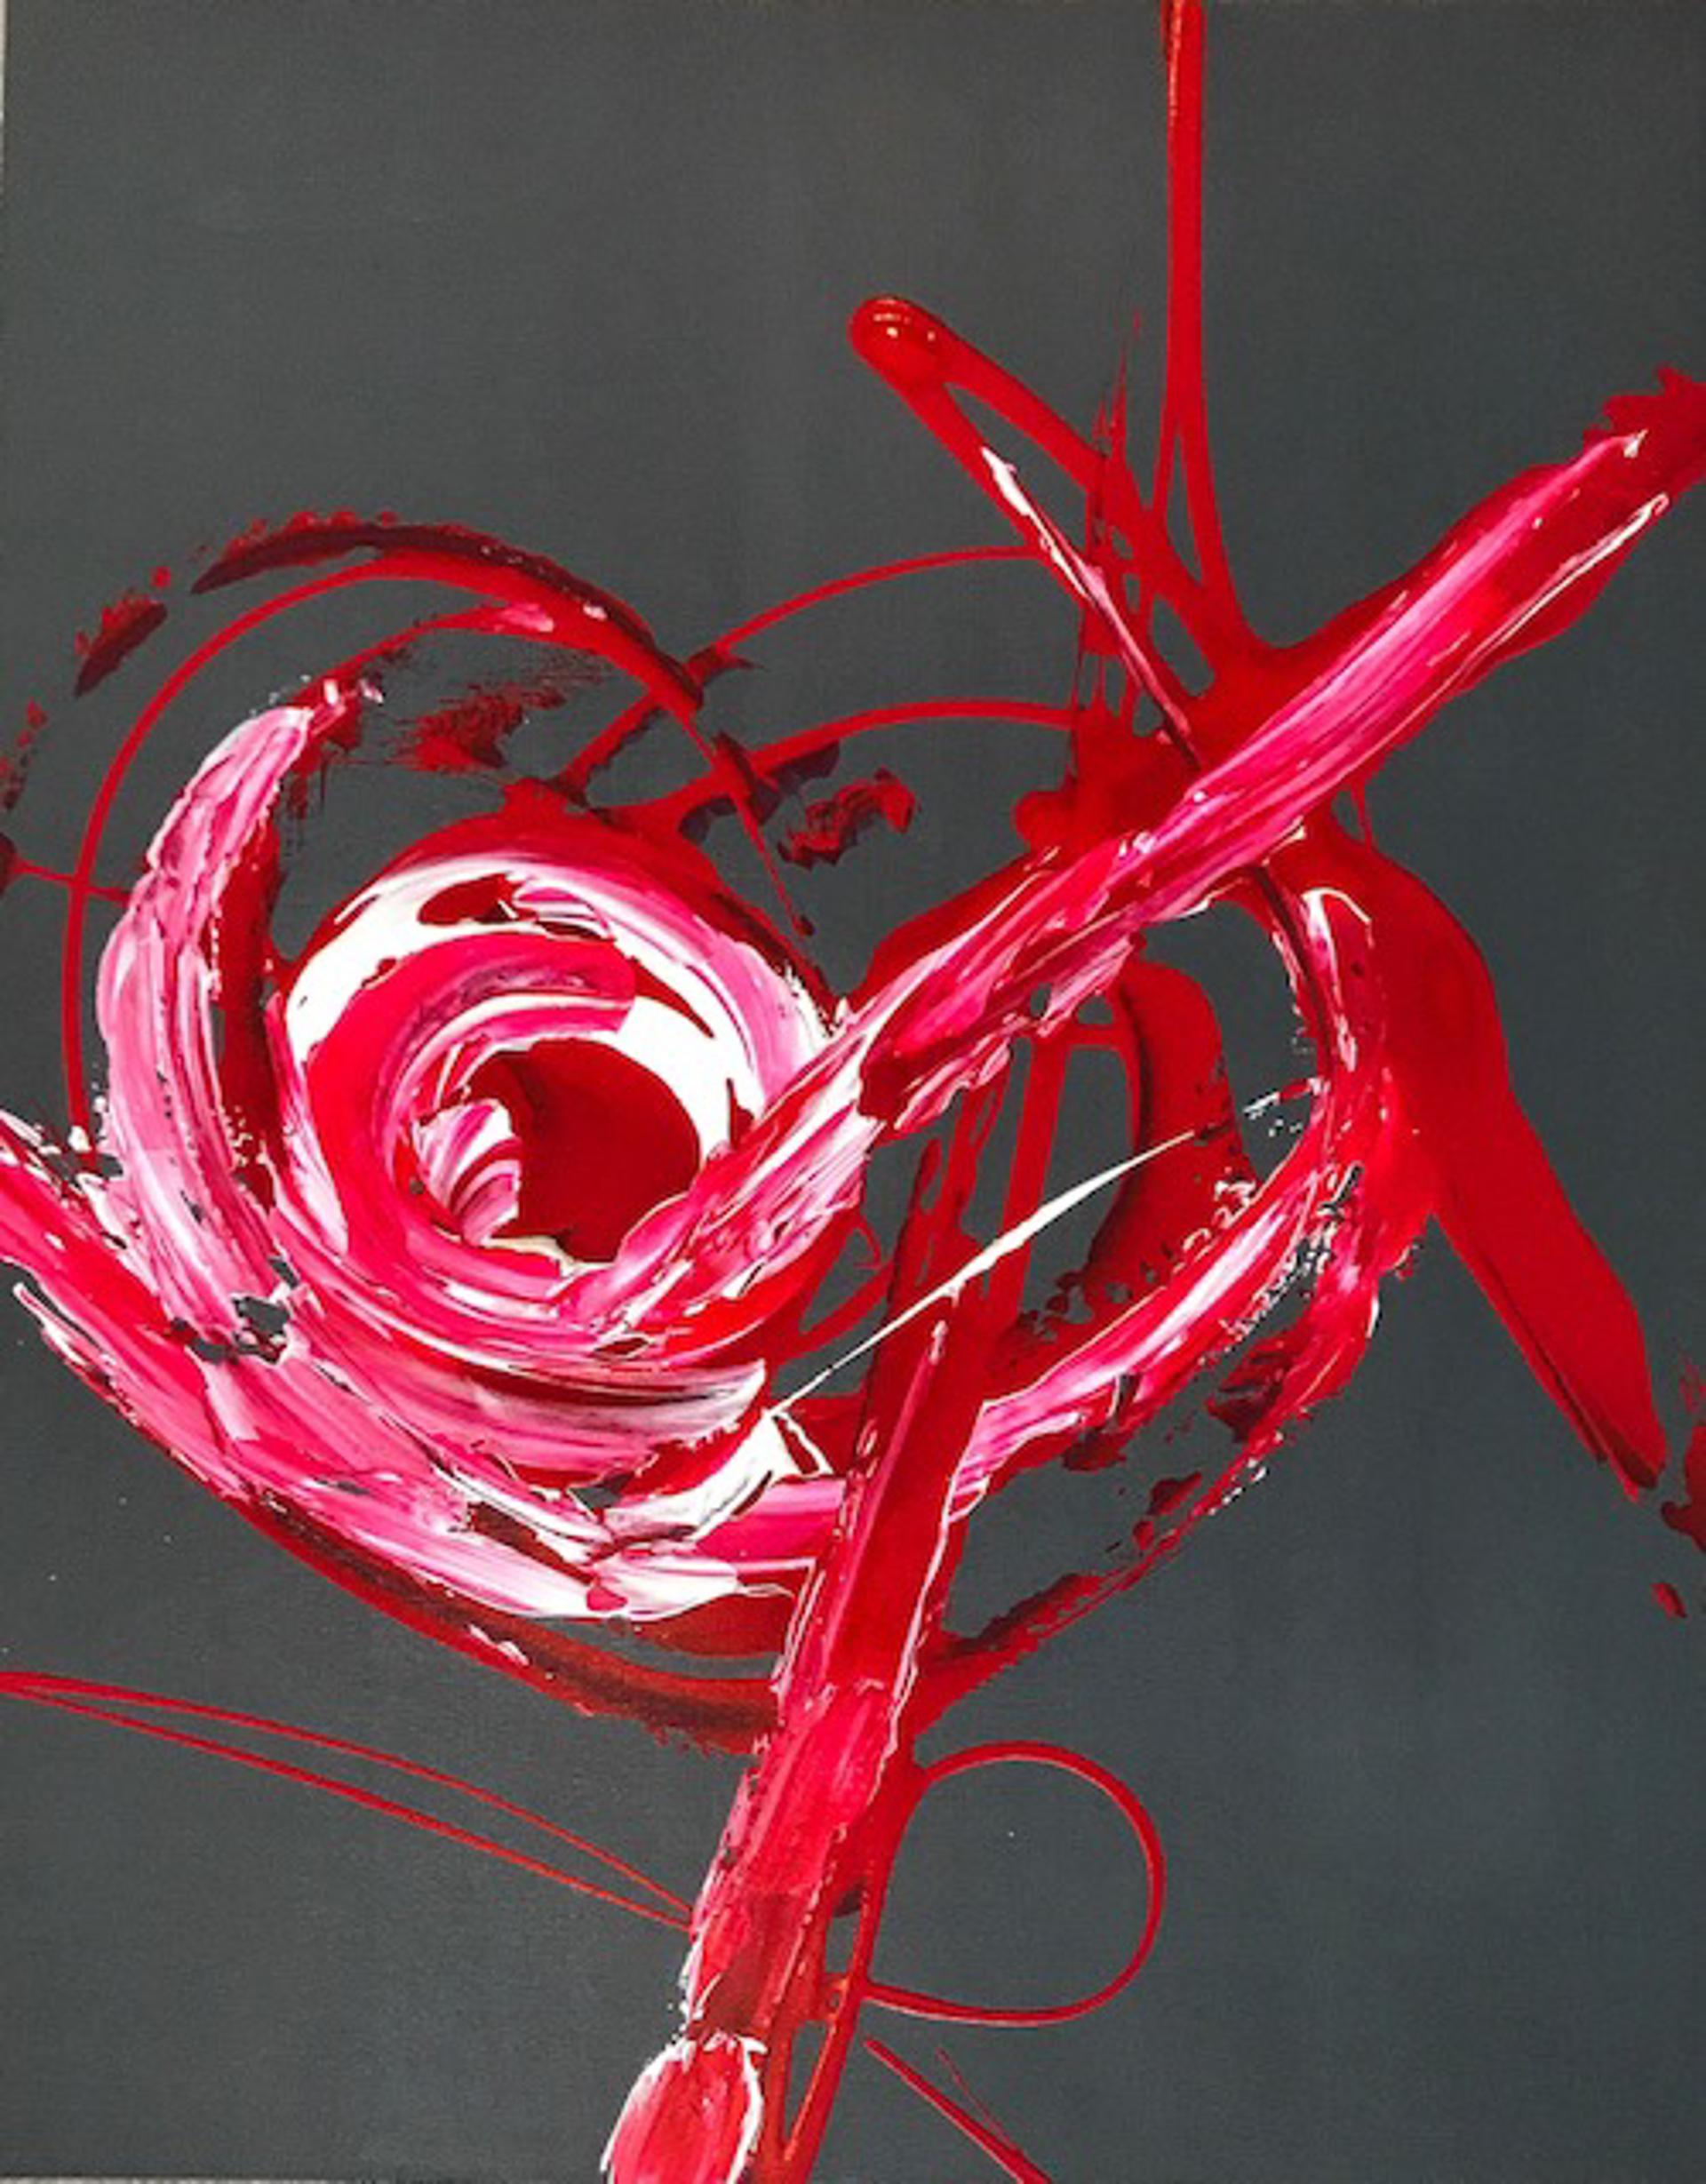 Heartspace No. 1 by Lisa Ledson